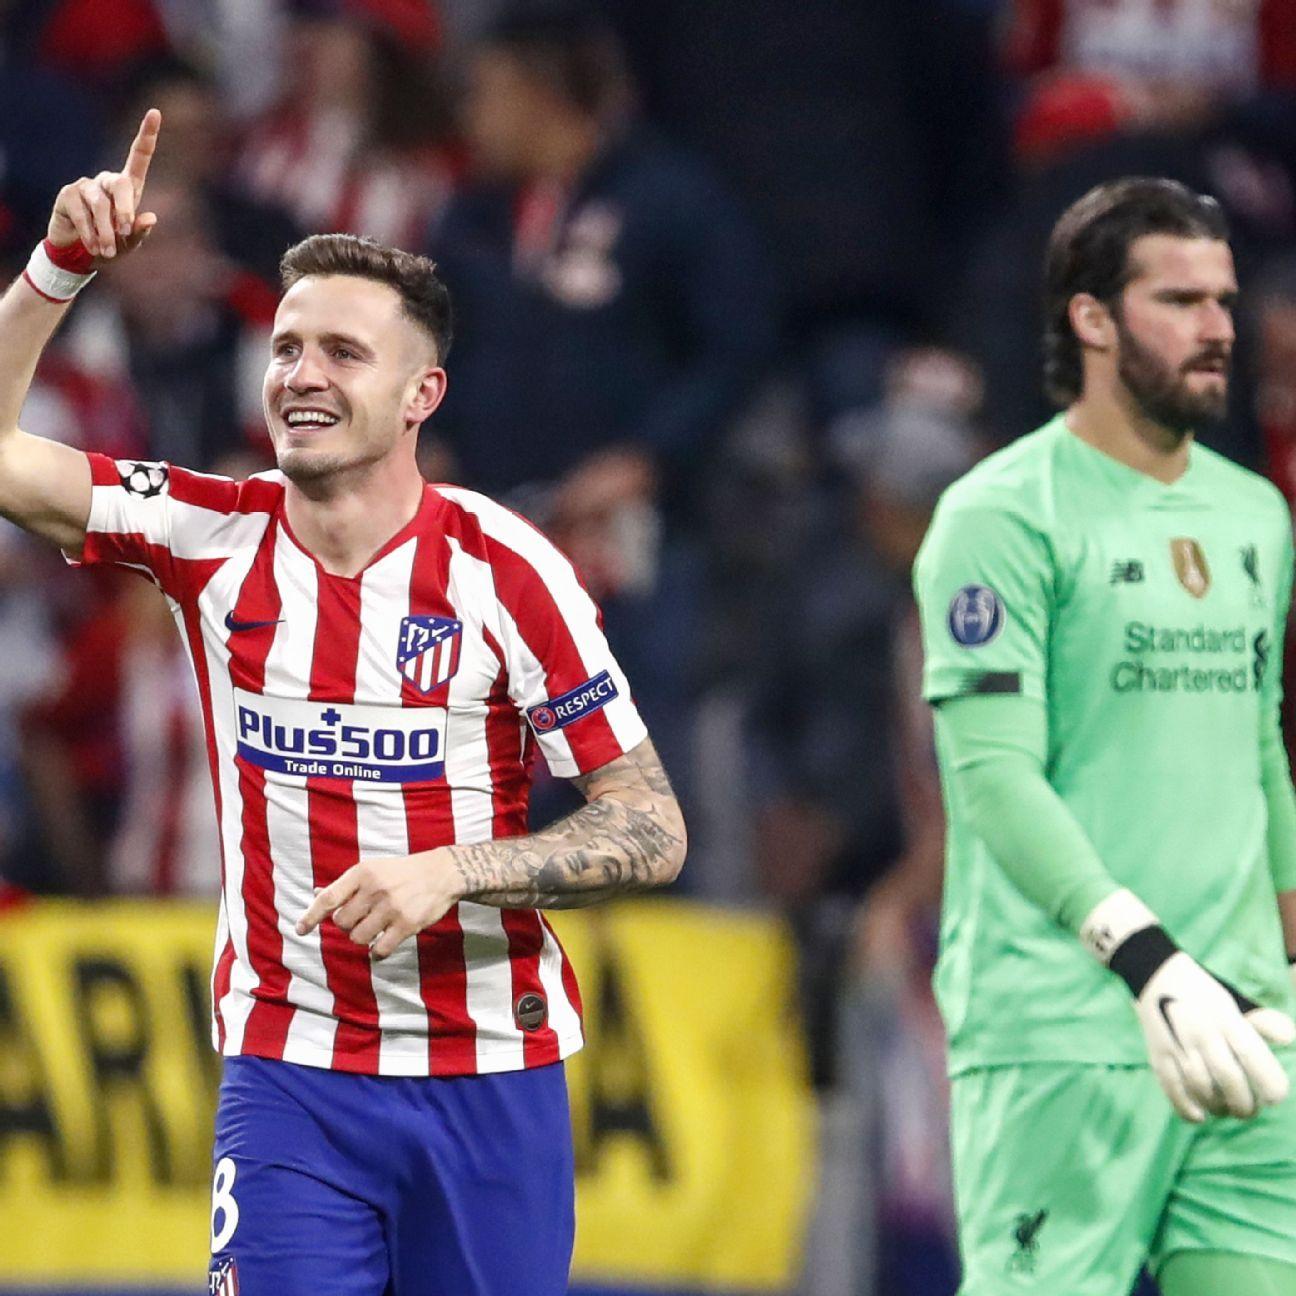 Atletico Madrid vs. Liverpool - Football Match Report - February 18, 2020 - ESPN